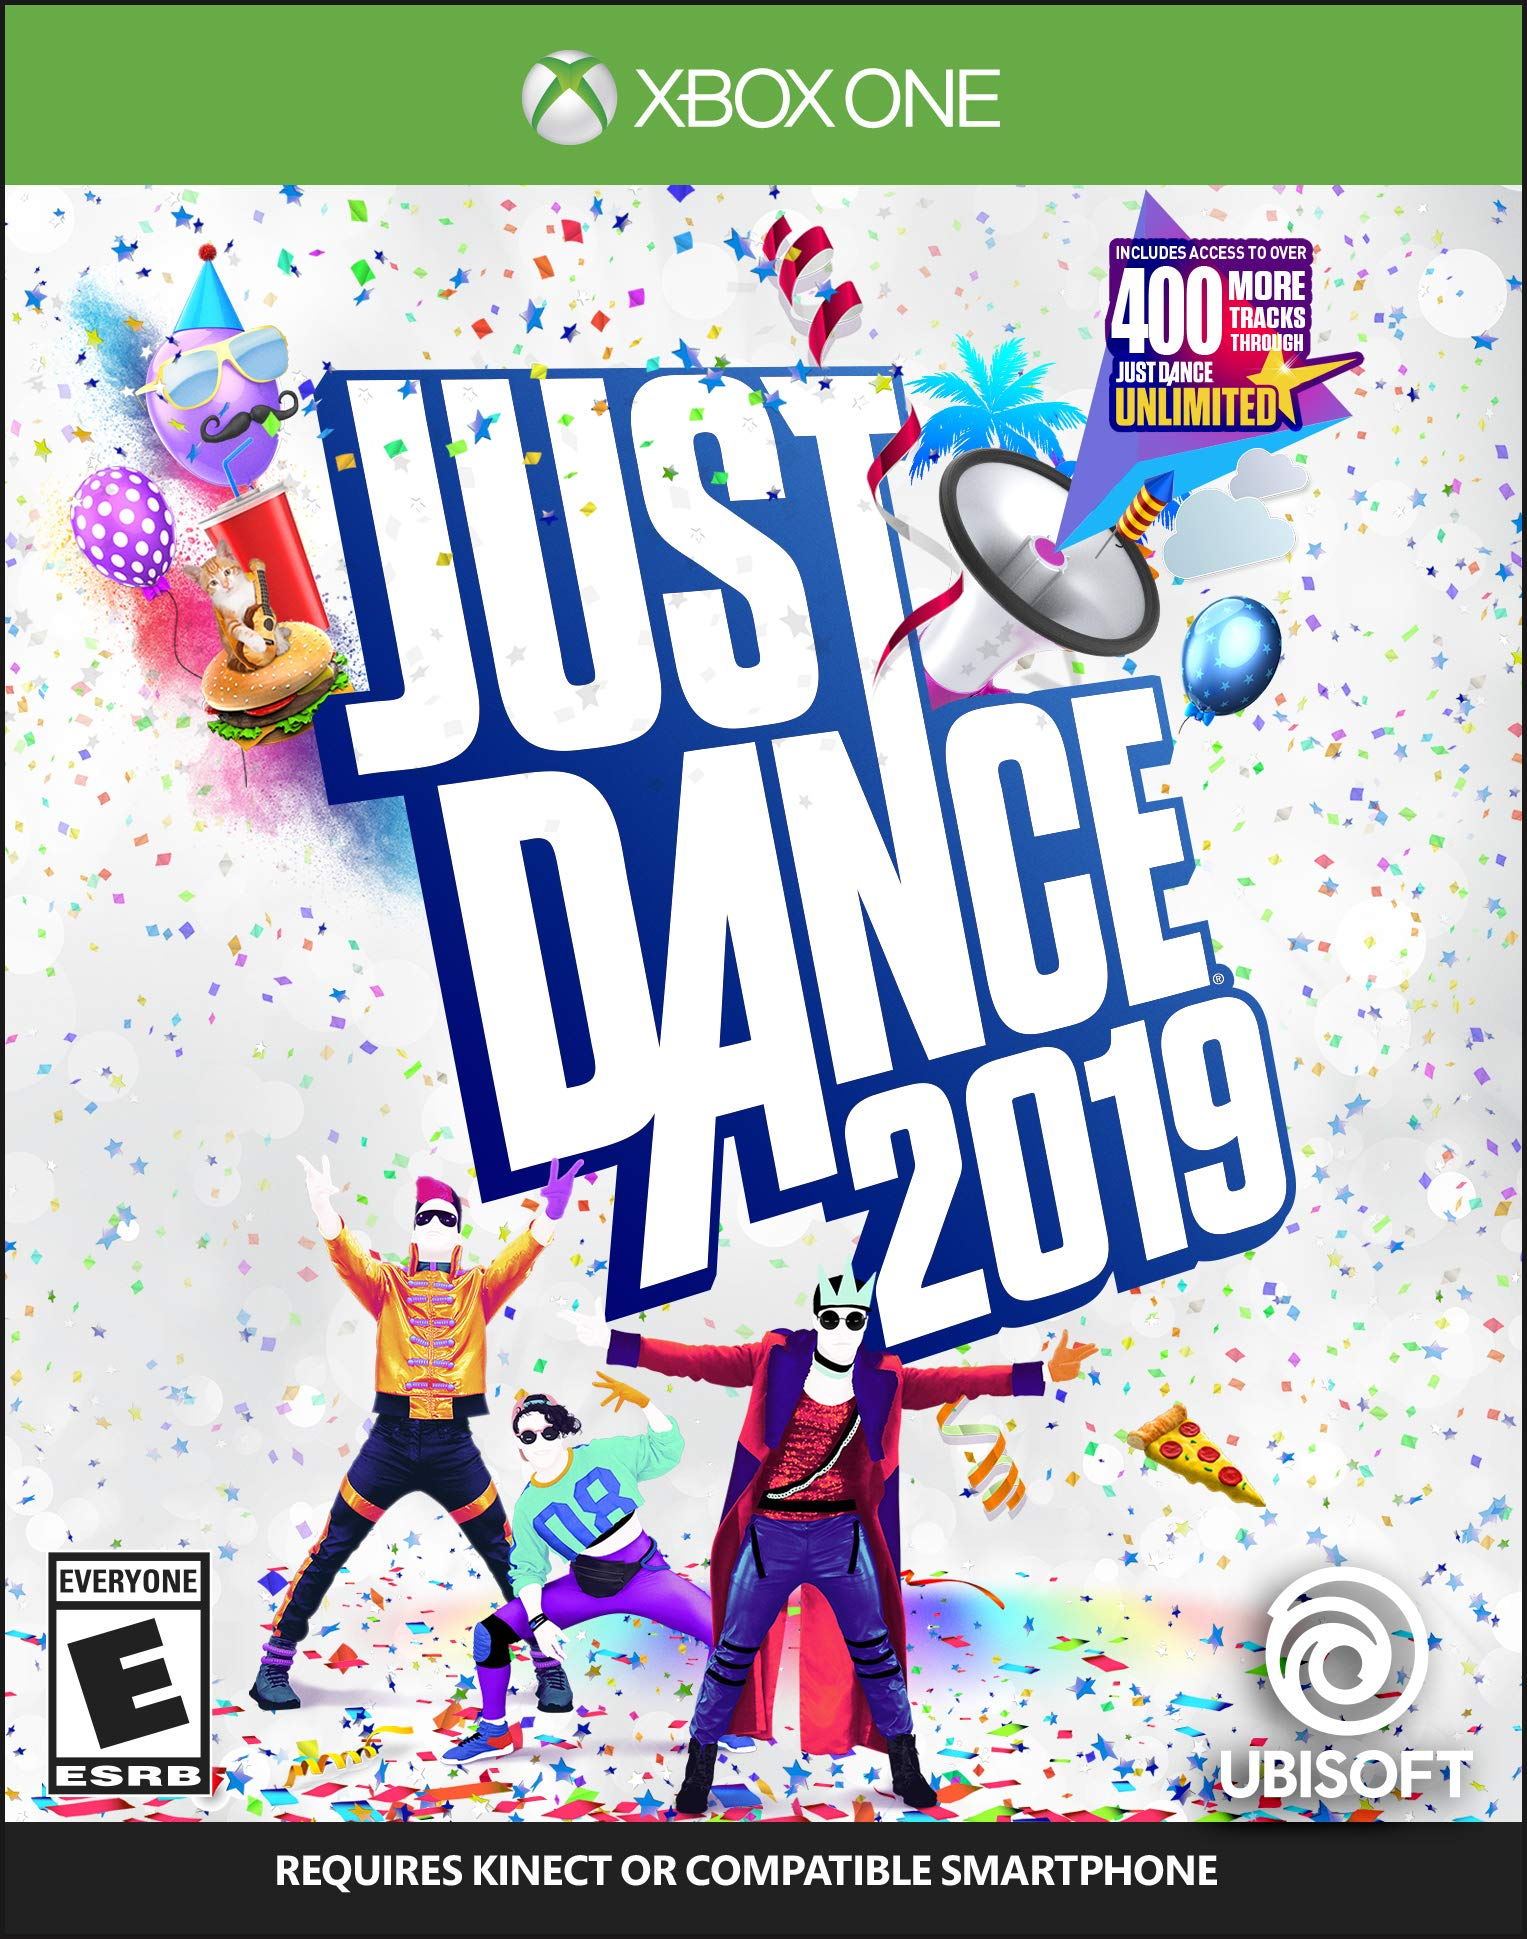 Xbox 360 Update 2019